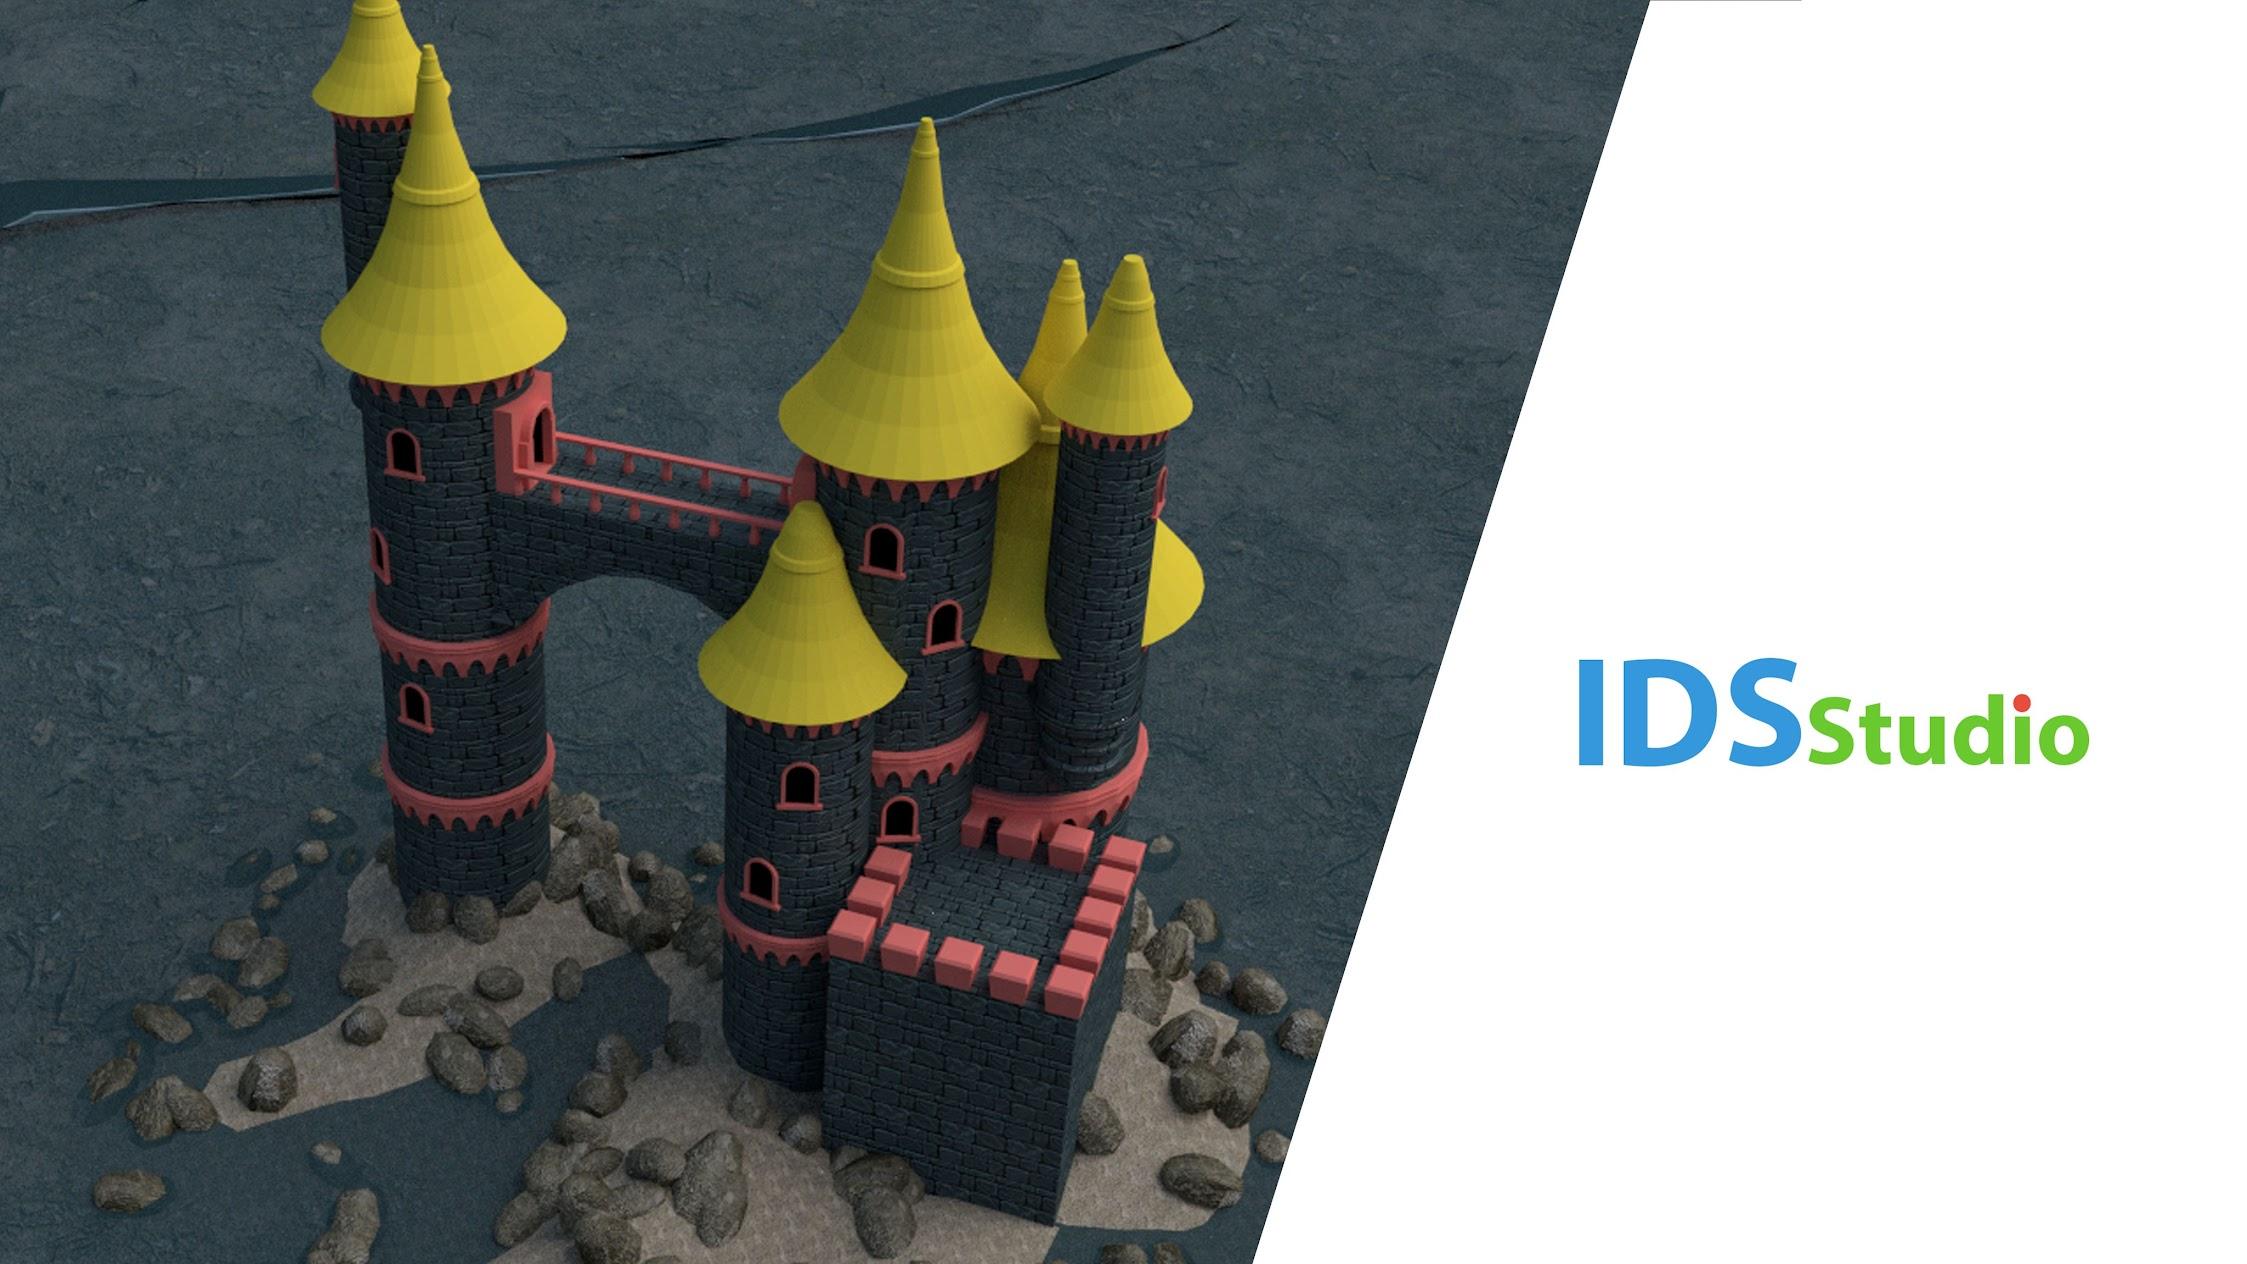 IDSstudio